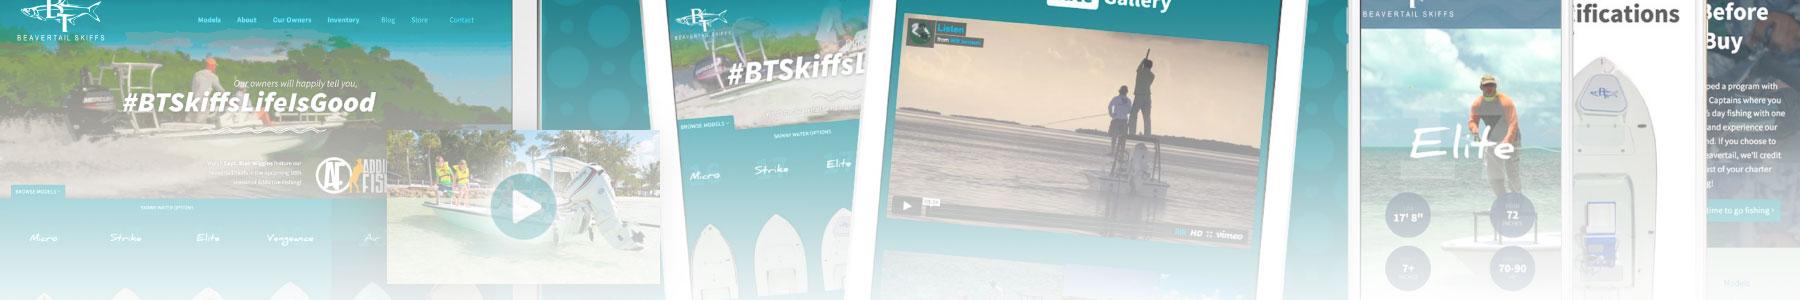 boat website design process